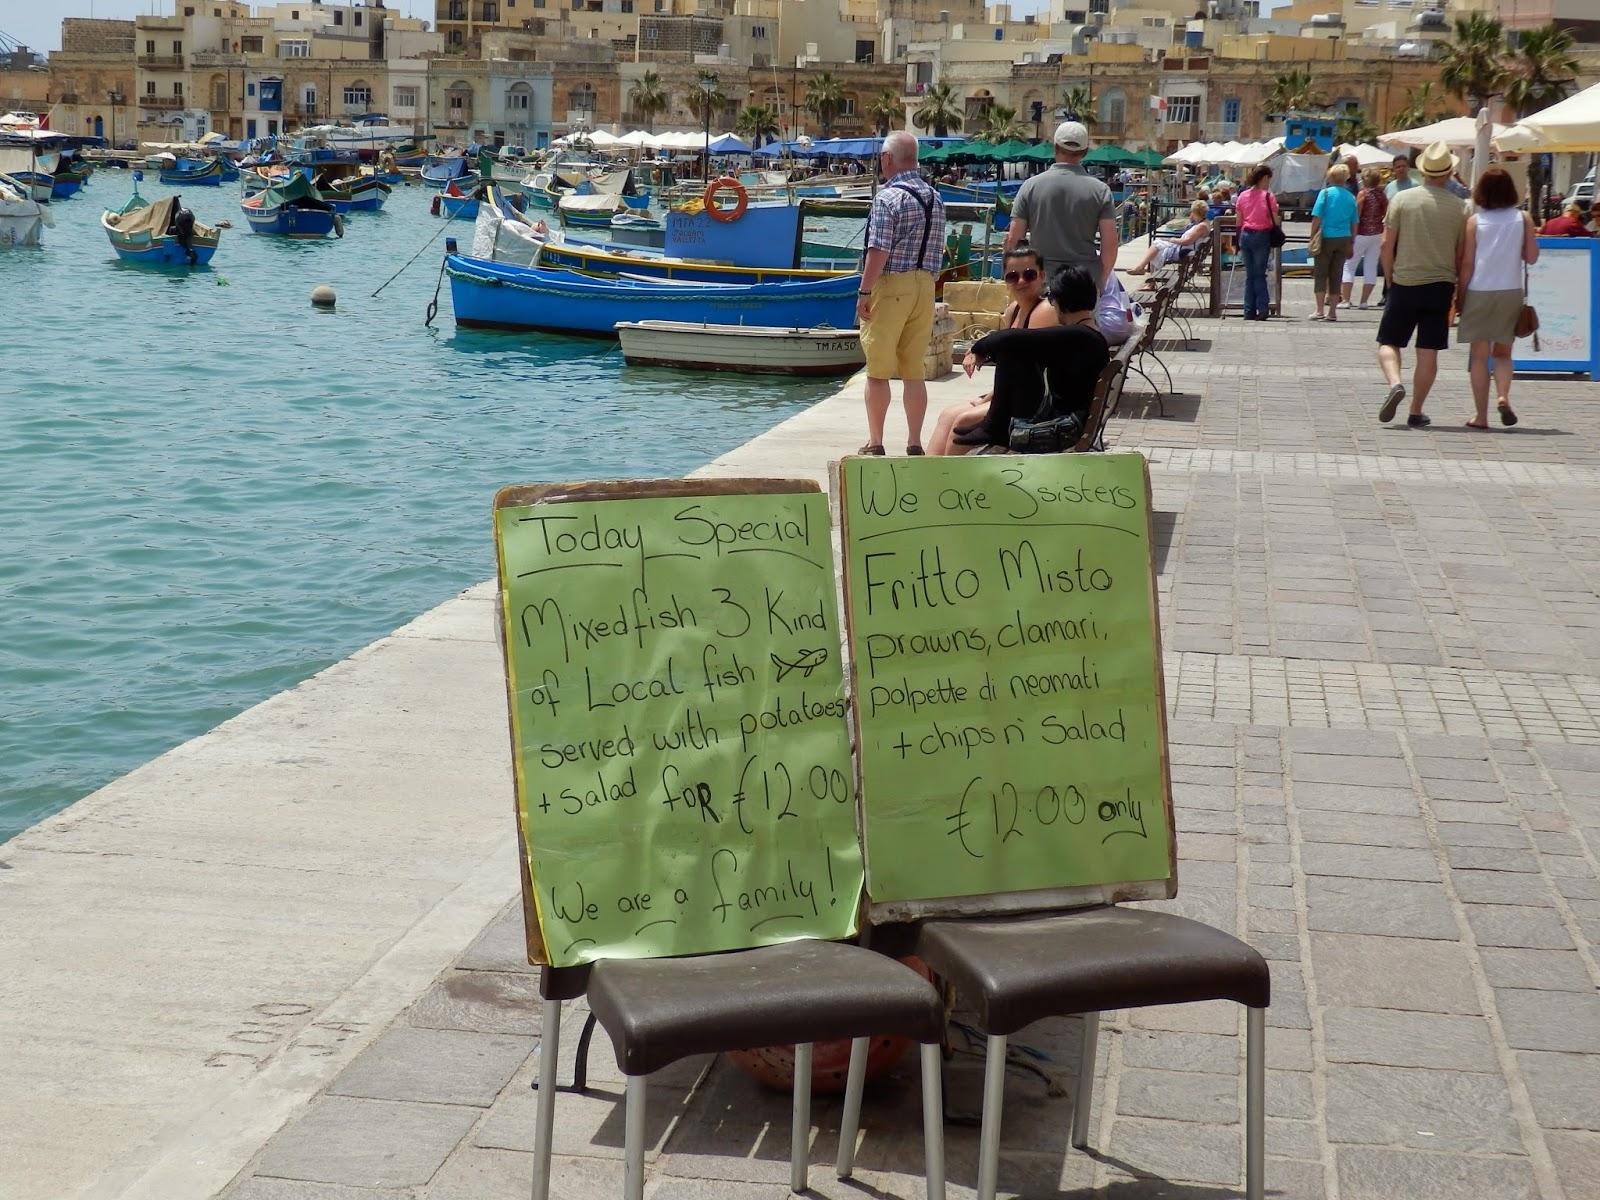 Fish restaurant signs Marsaxlokk, Malta